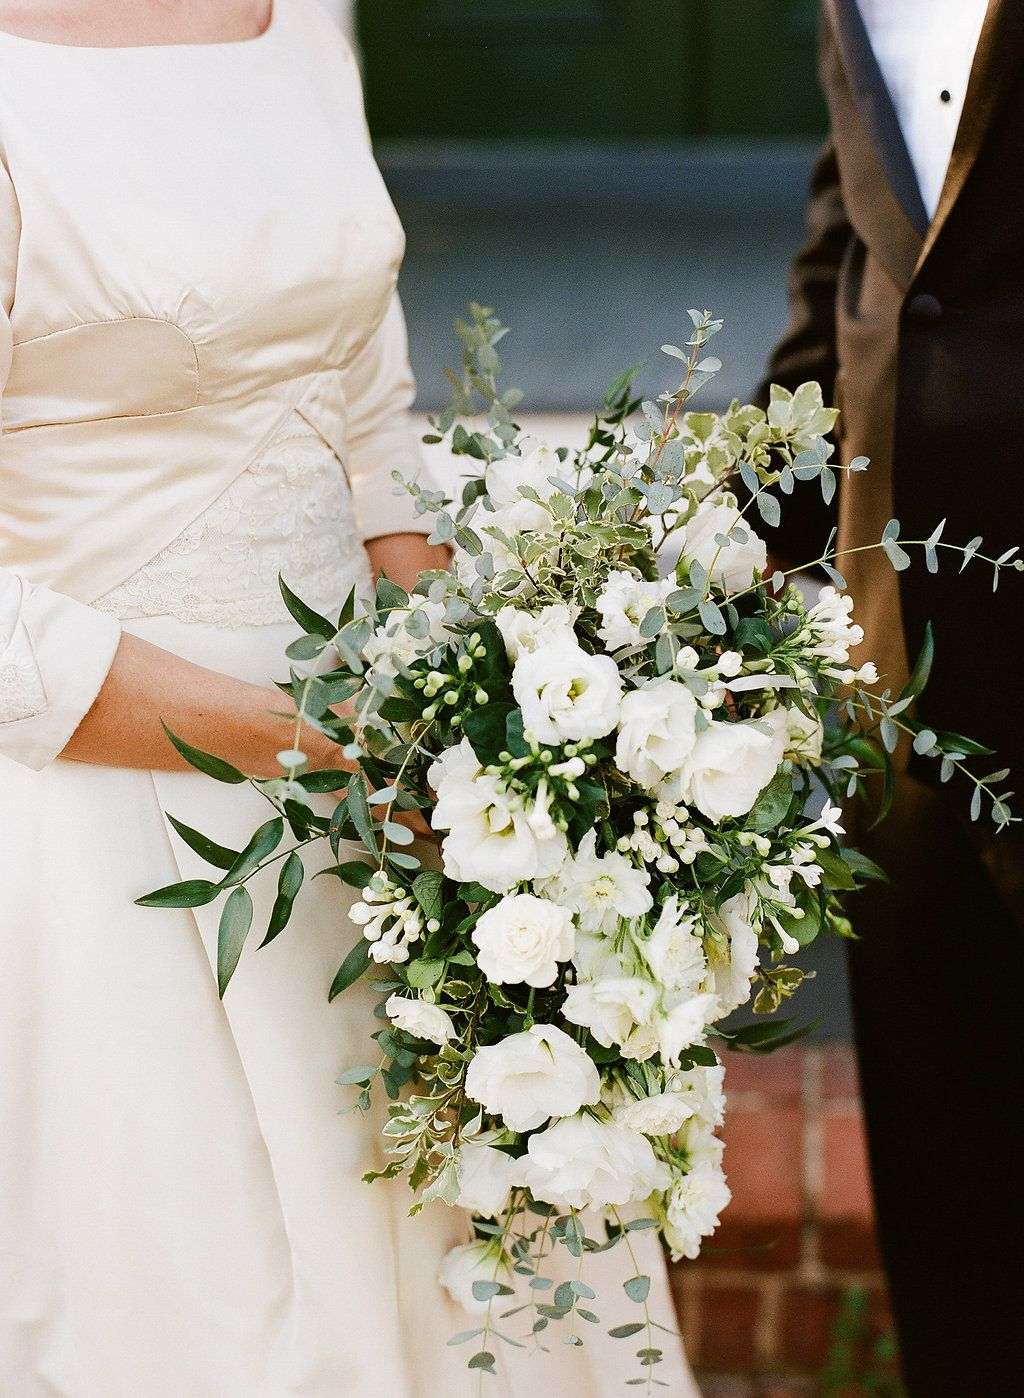 Bridal bouquet by petalsandtwigsrva.com Photo by Jen Fariello Photography